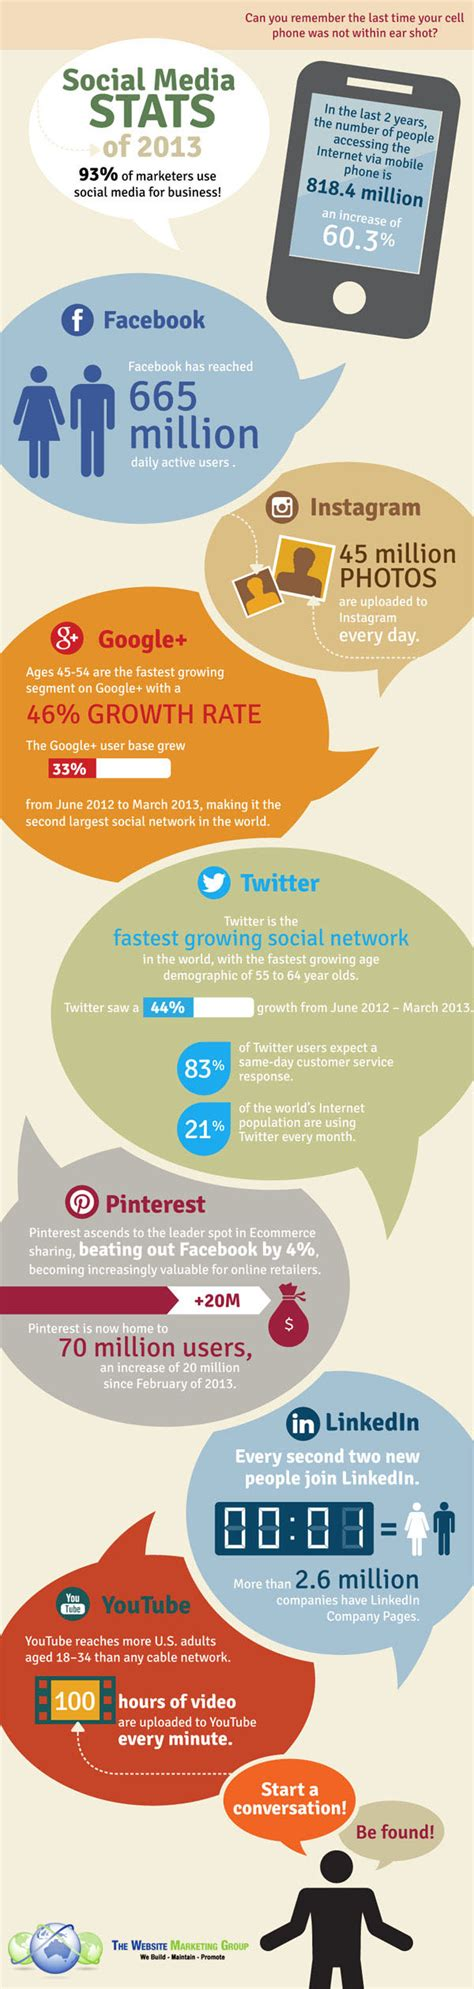 si鑒e social social media ecco le statistiche 2013